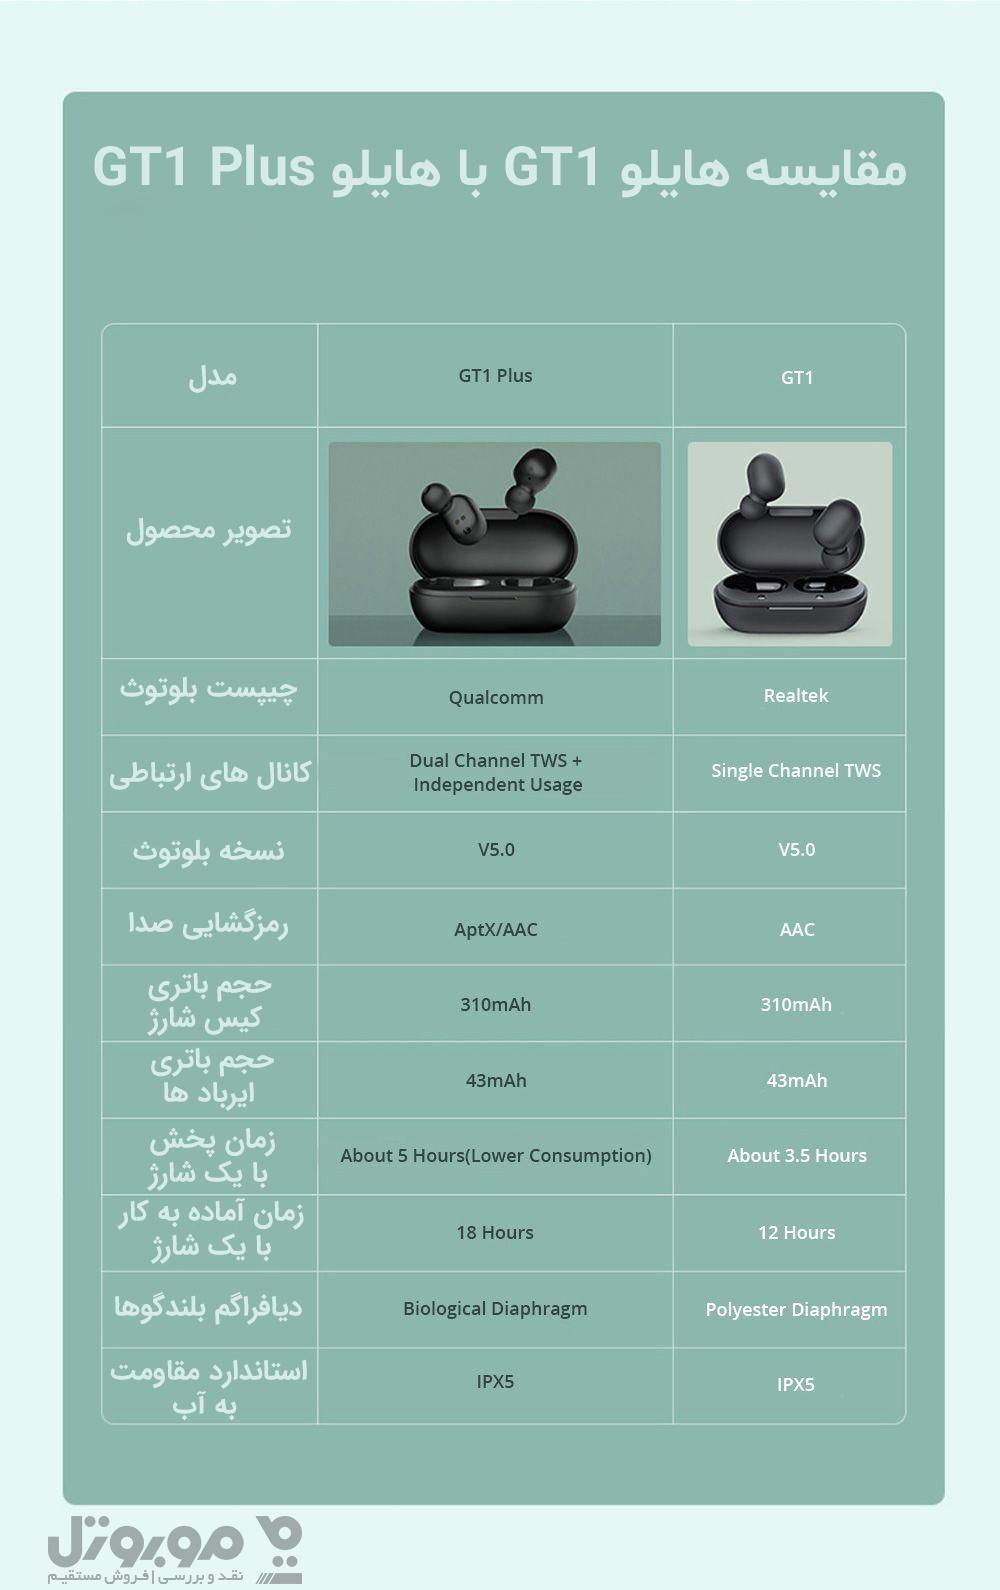 جدول مقایسه شیائومی Haylou GT1 Plus و شیائومی Haylou GT1